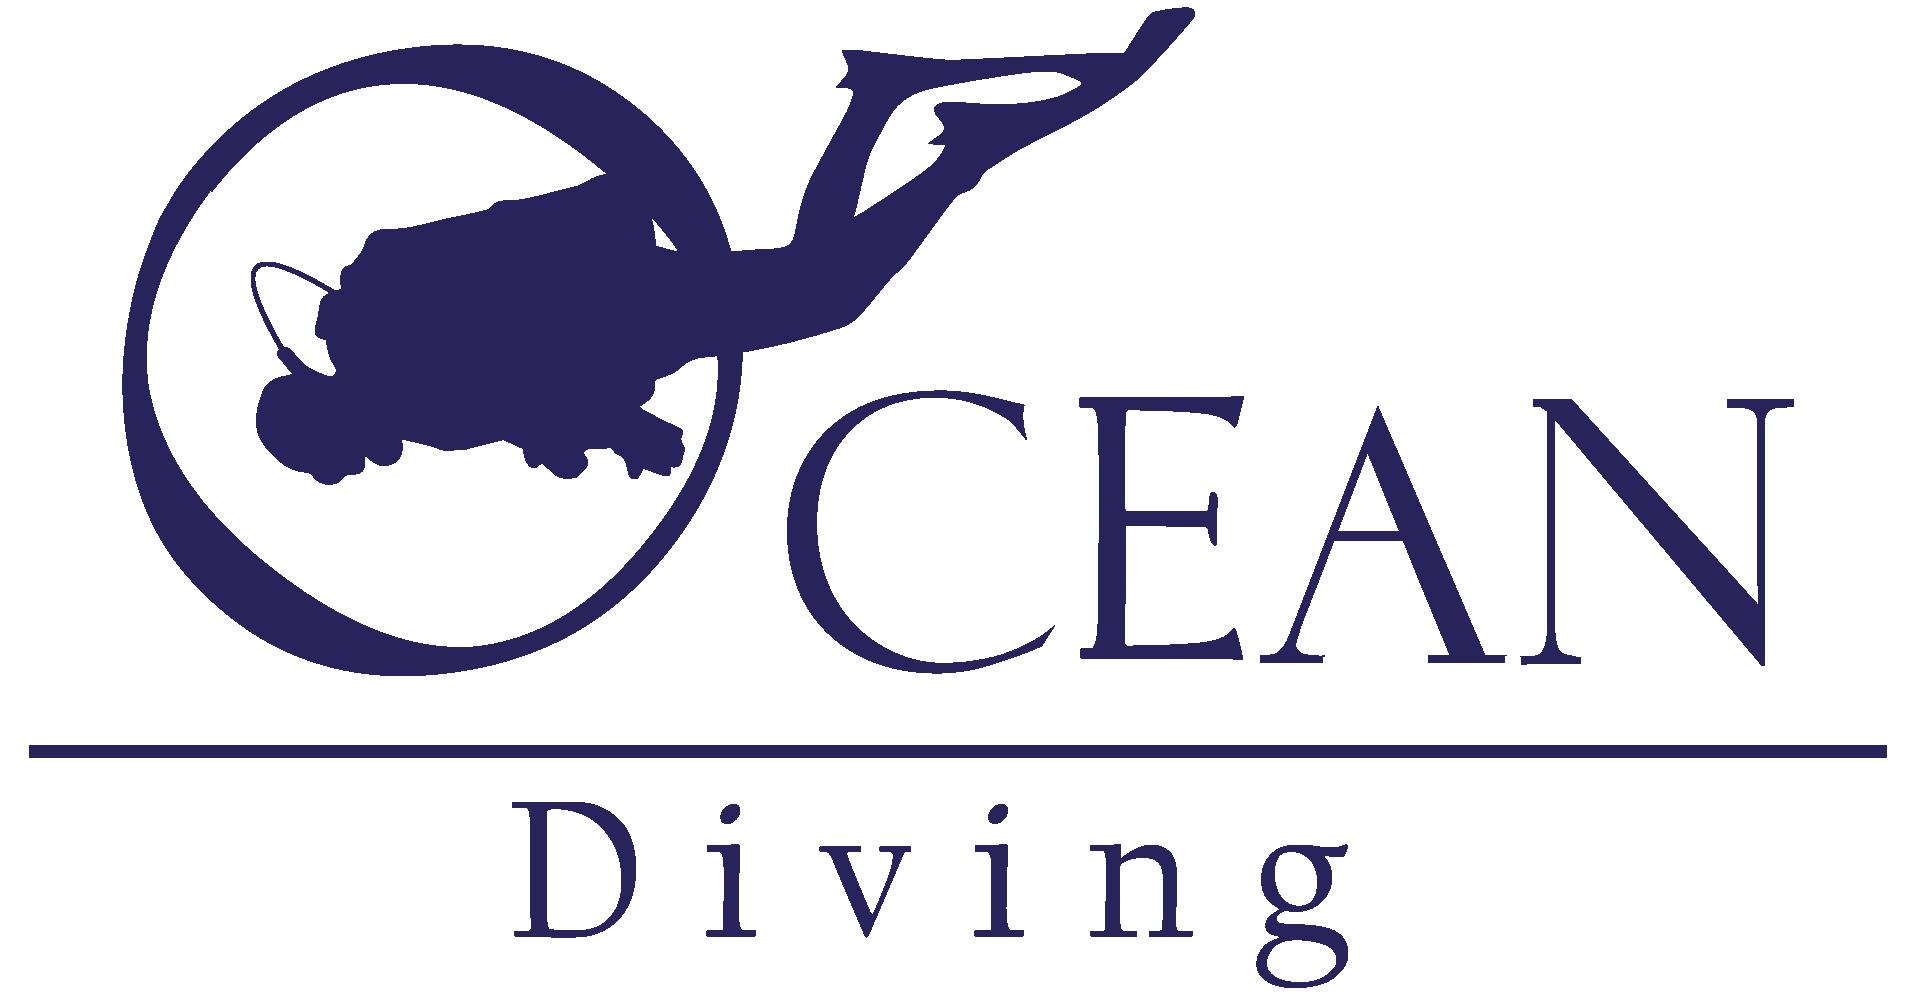 Diving boca chica . Diver clipart ocean diver